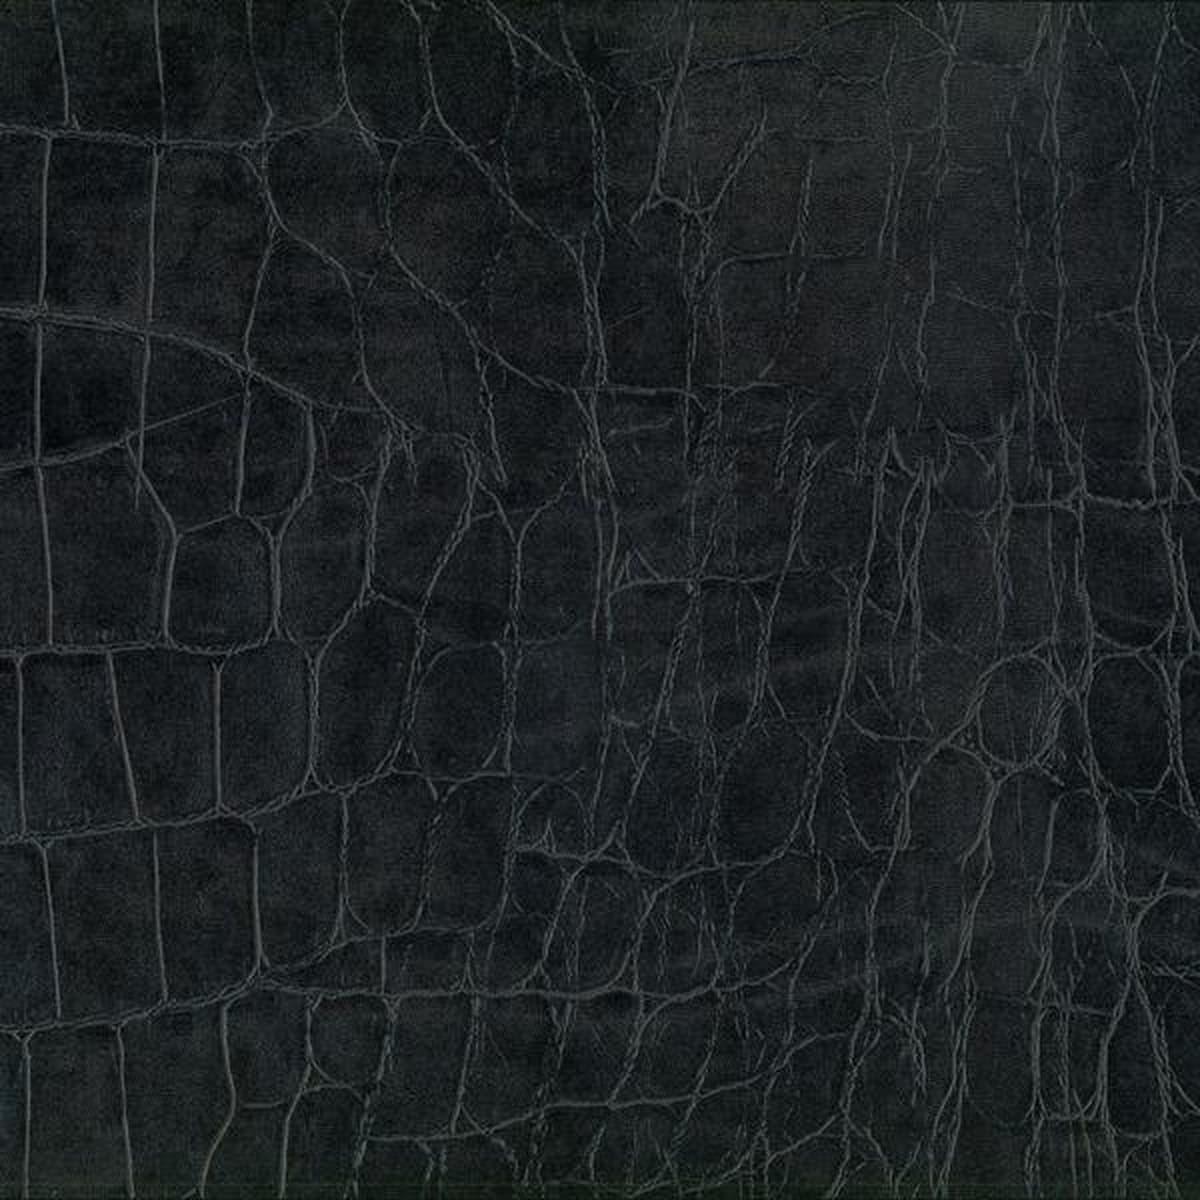 Krokodille svart kontaktplast